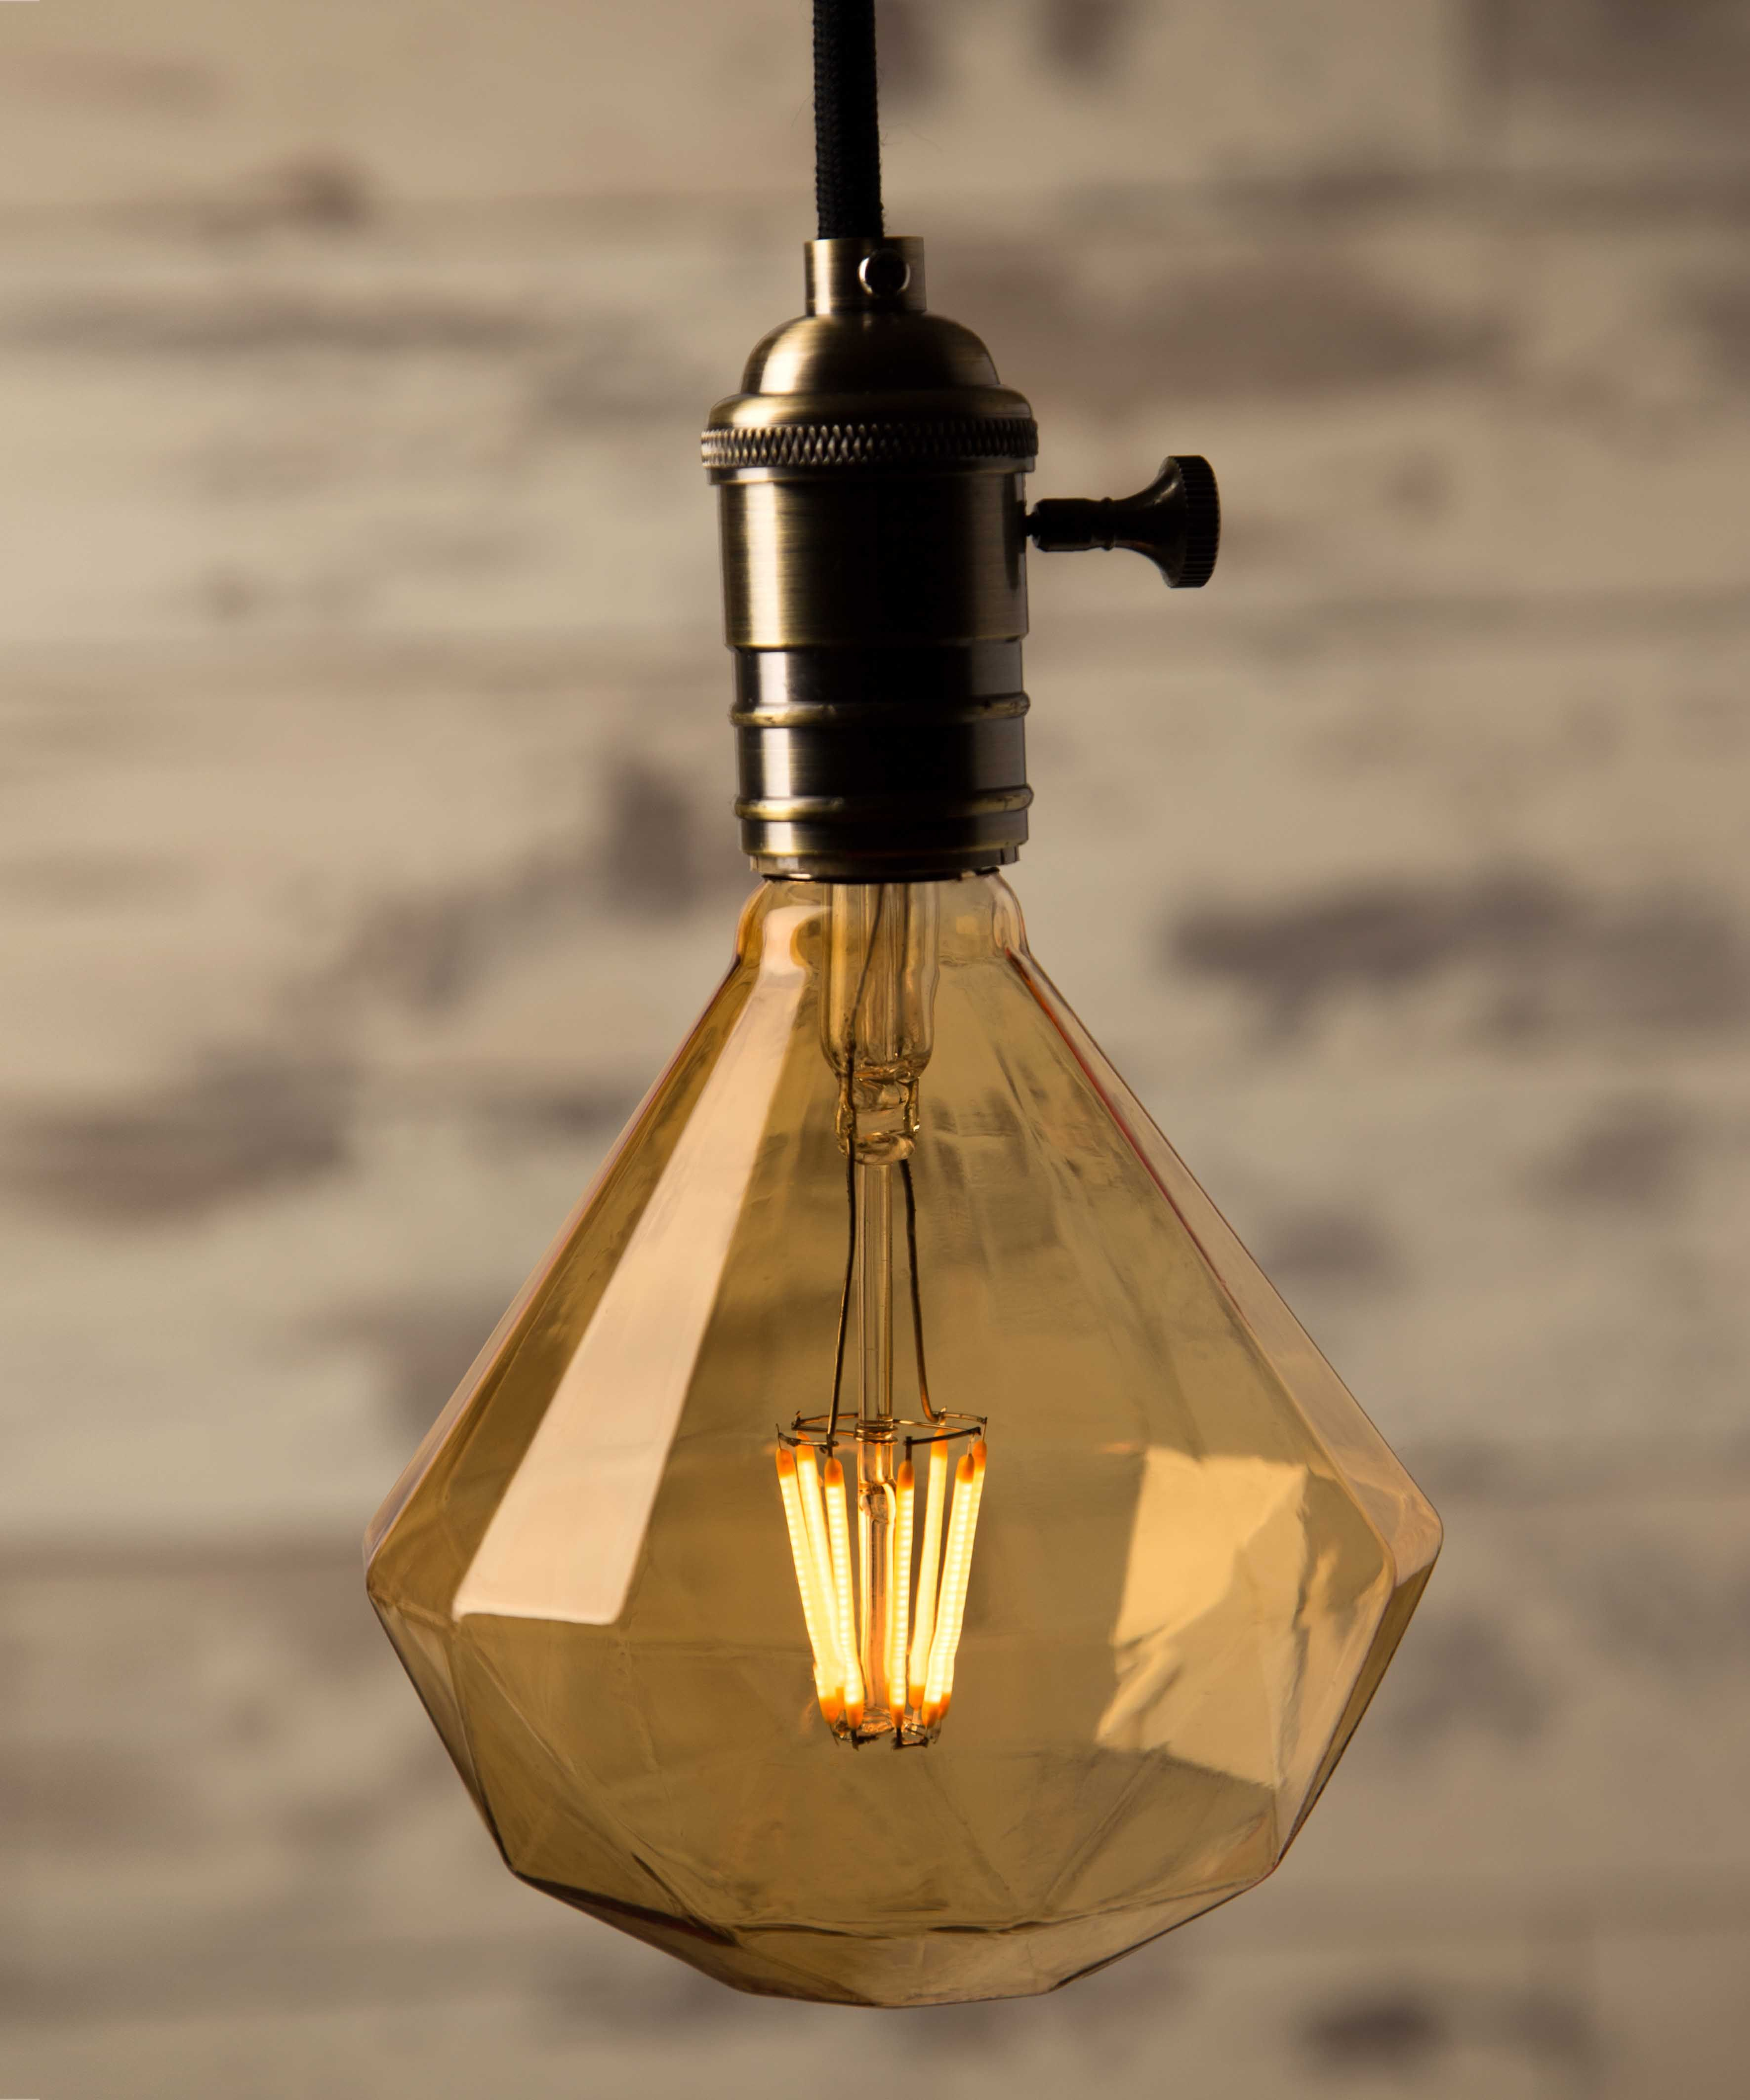 vintage looking lighting. led soft diamond 4l william and watson vintage edison bulb industrial light 3w looking lighting